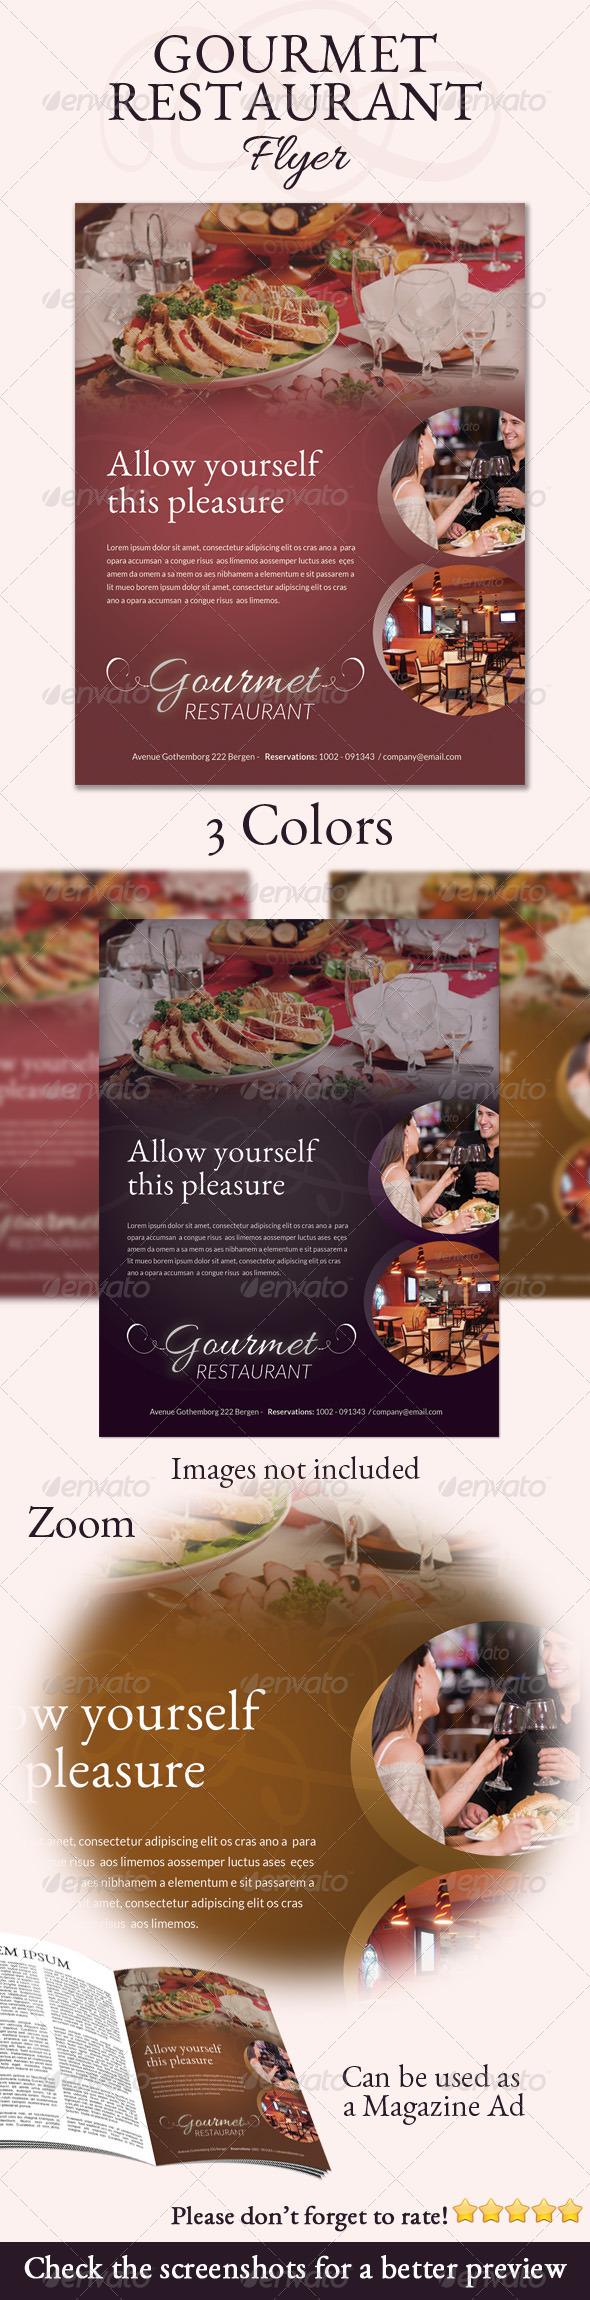 Gourmet Restaurant Flyer - Restaurant Flyers